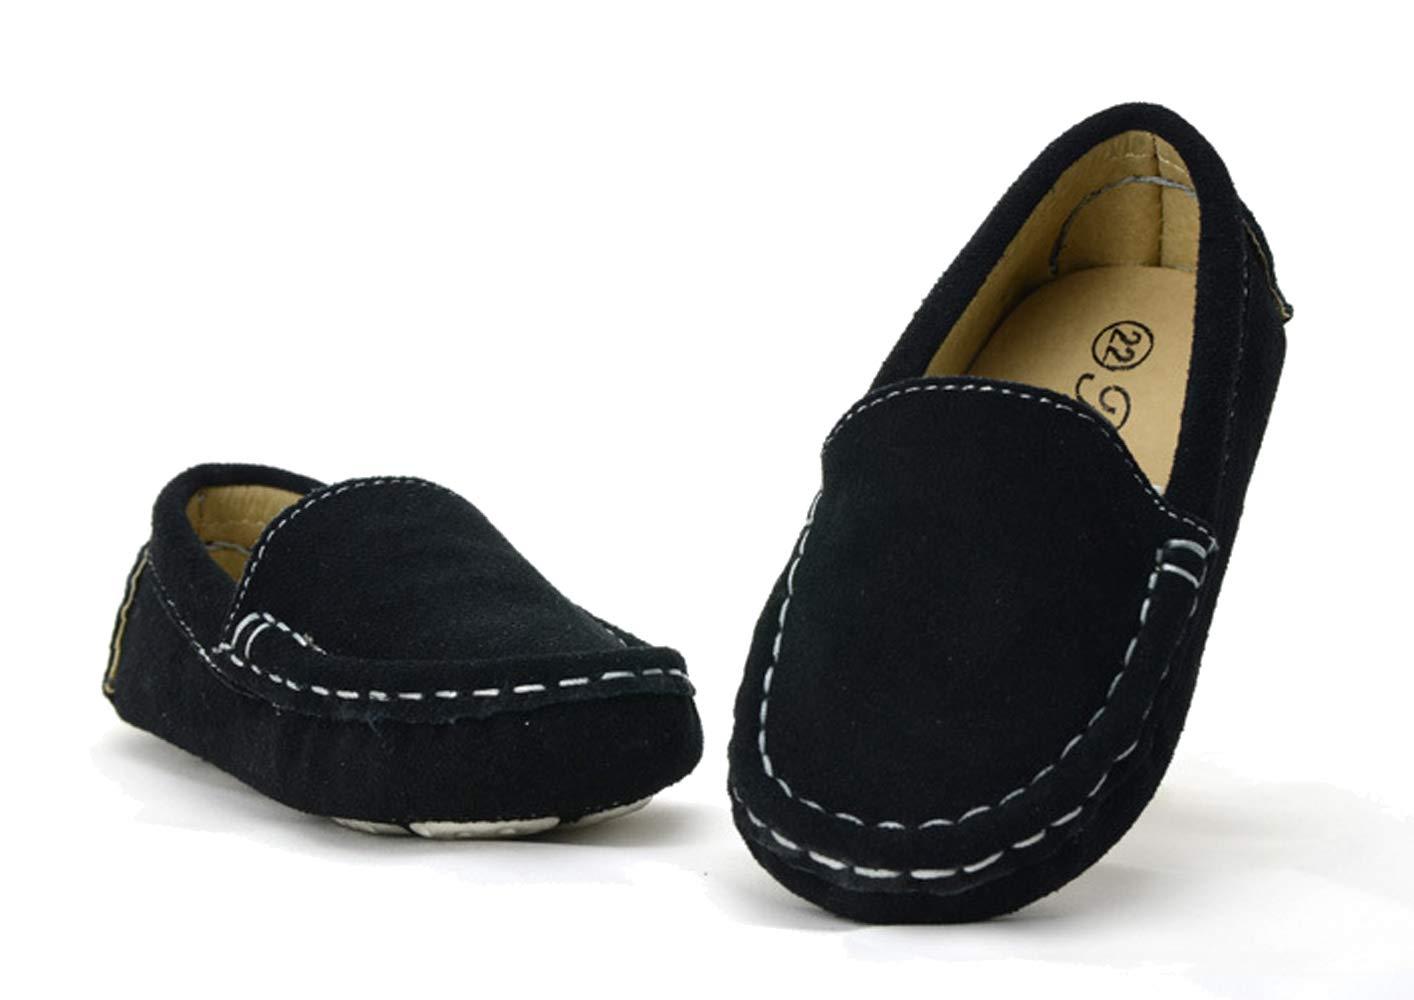 WUIWUIYU Boys' Girls' Suede Slip-On Loafers Flats Moccasins Comfort Casual Shoes Black Size 7 M by WUIWUIYU (Image #3)